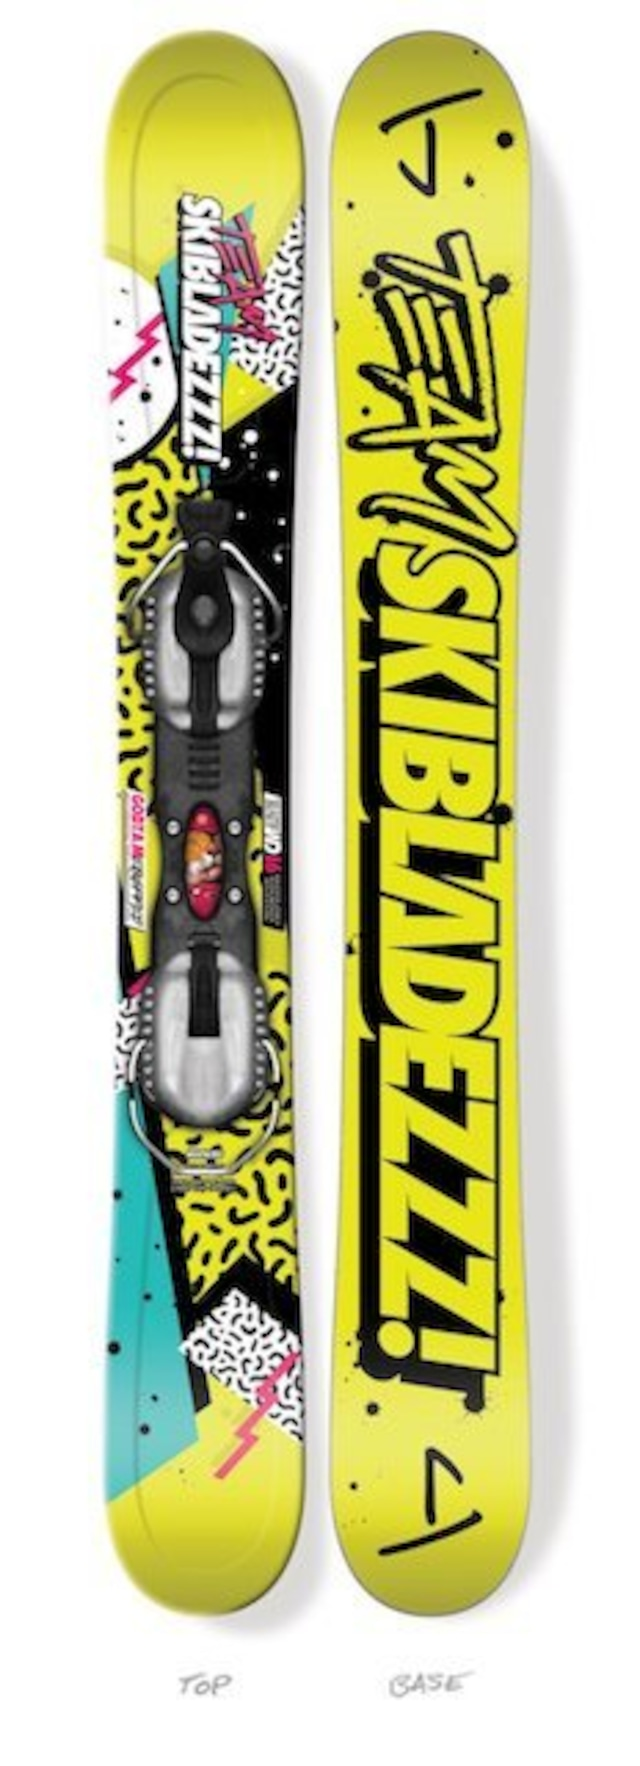 "J skis - ""TEAM SKIBLADEZZZ"" スキーブレード"